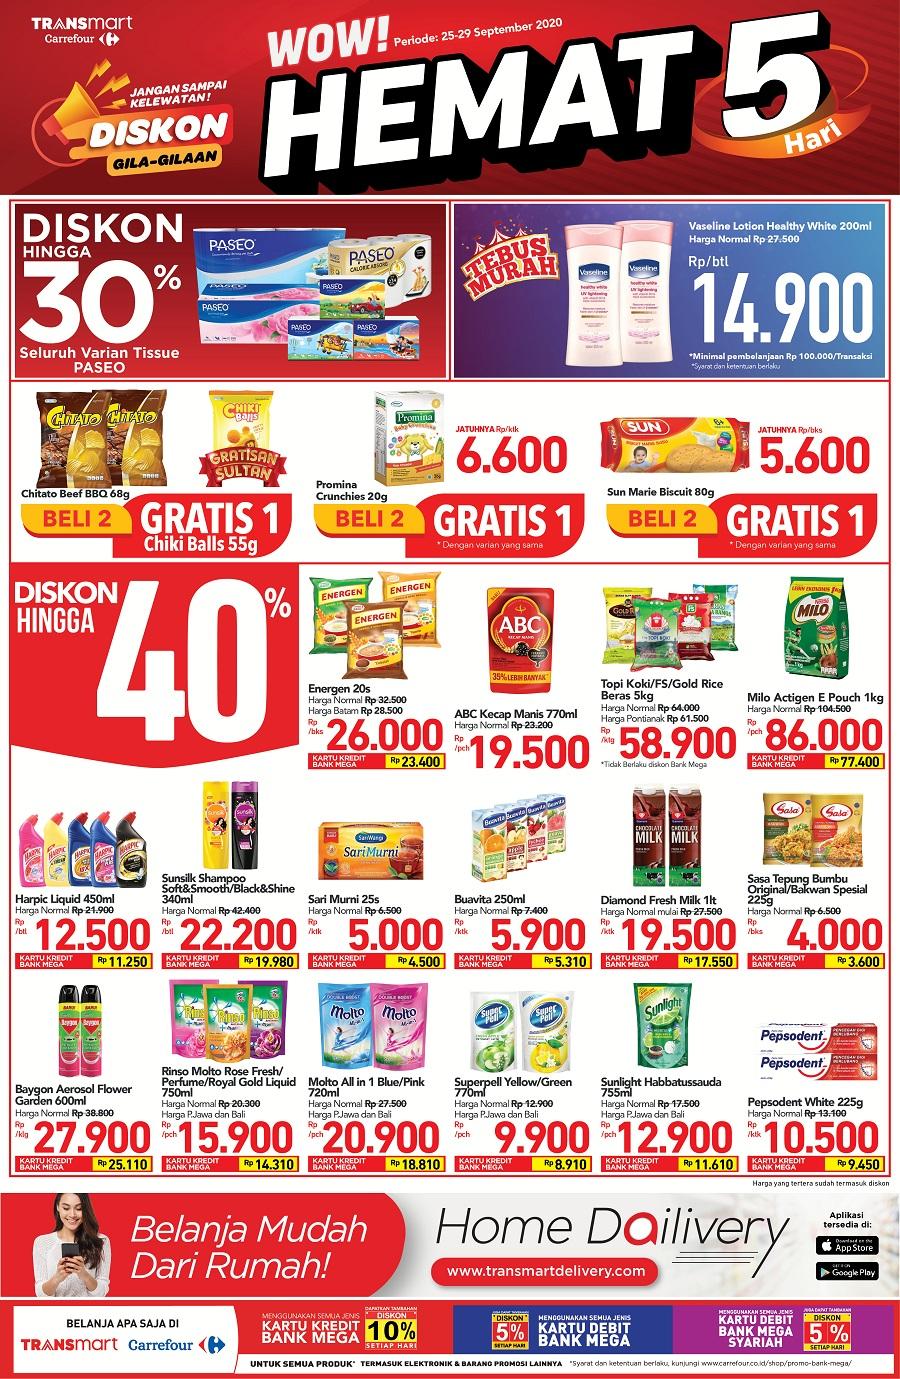 Promo Transmart Carrefour 25 September 1 Oktober 2020